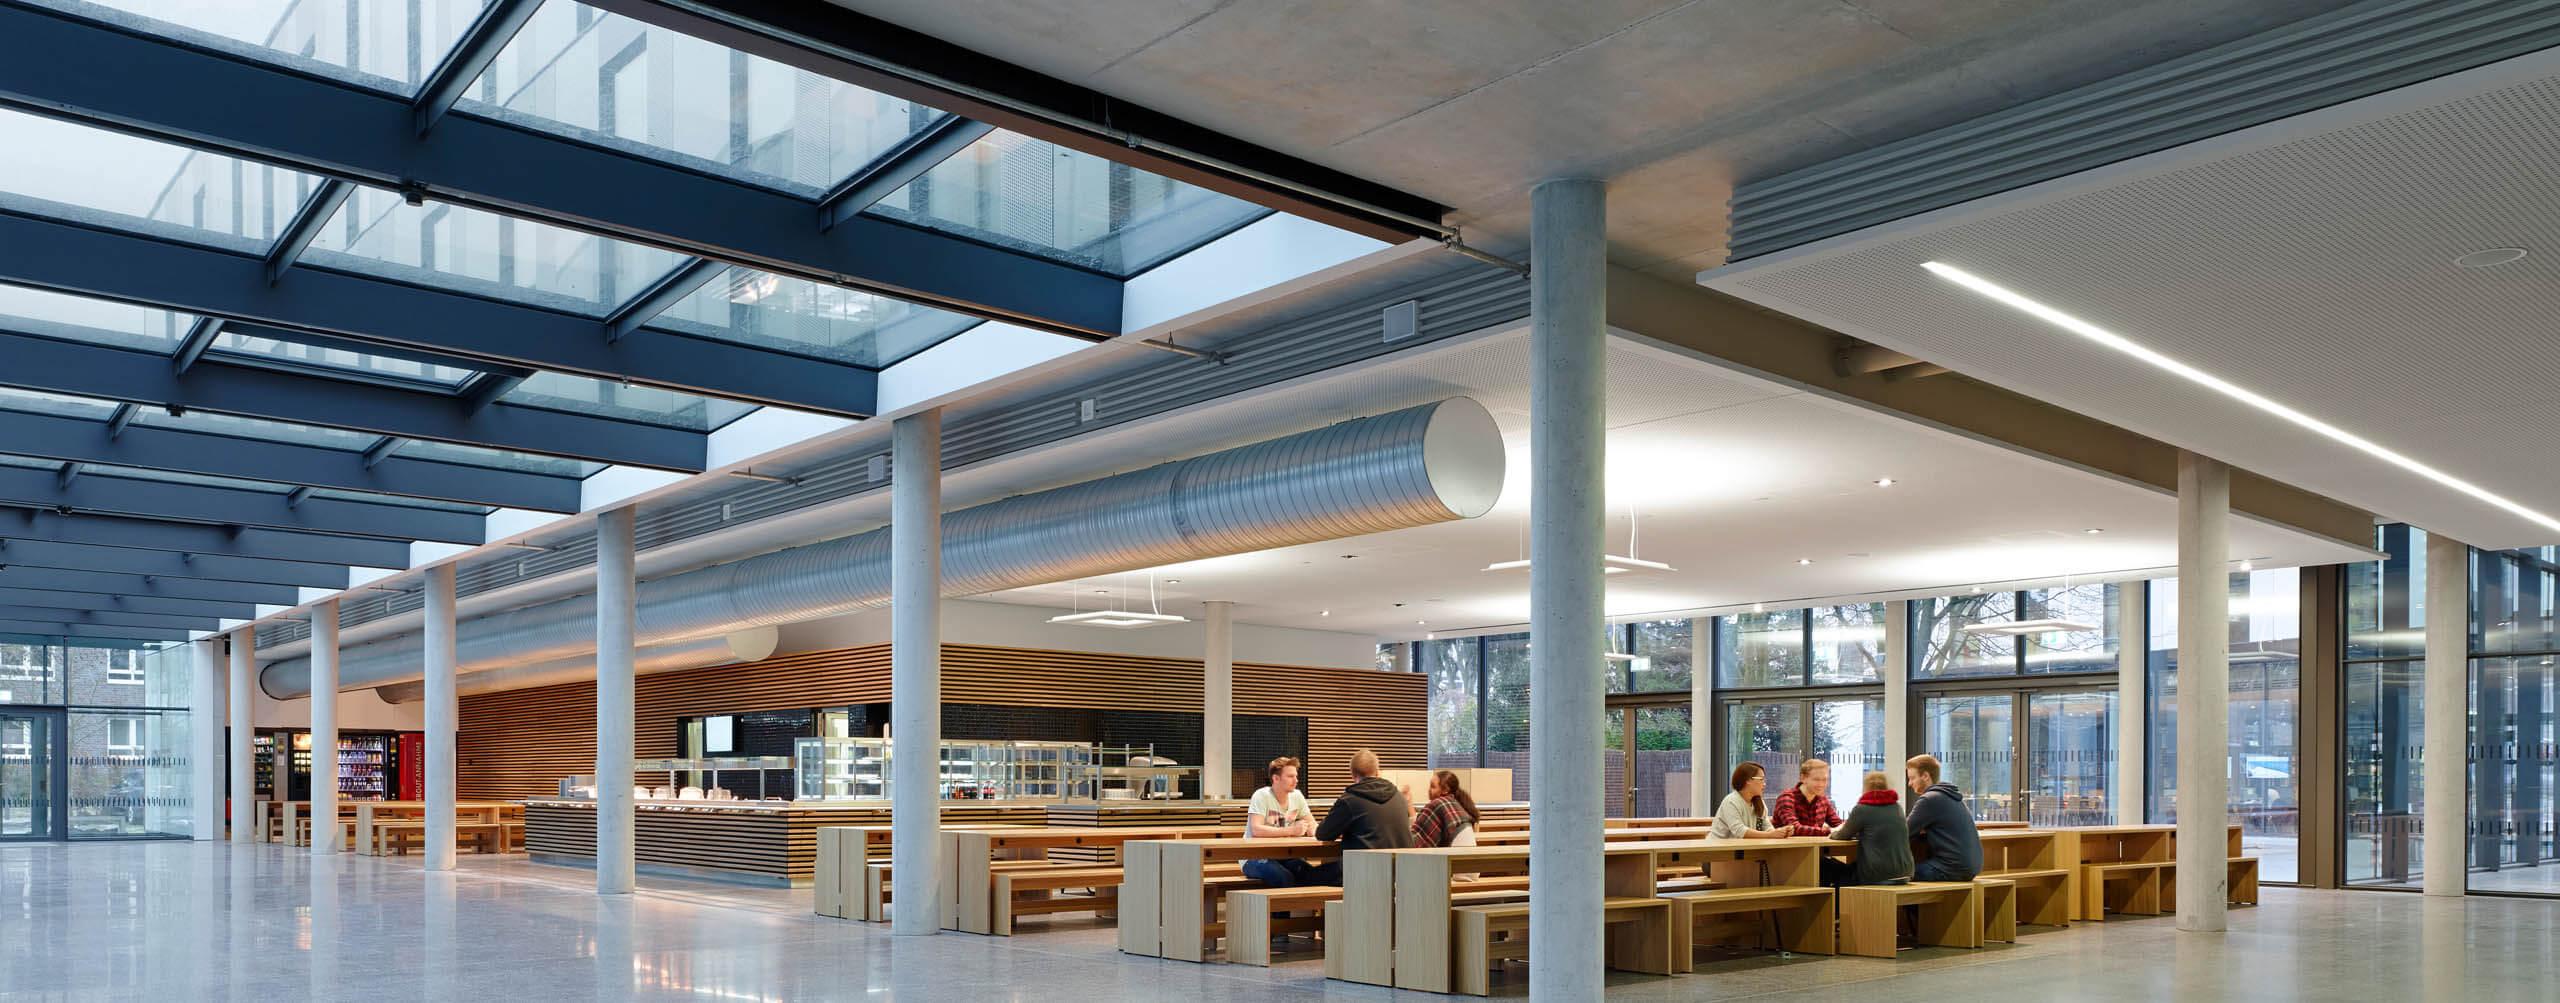 Never-Stop-Growing - Mensa Campus Bottrop